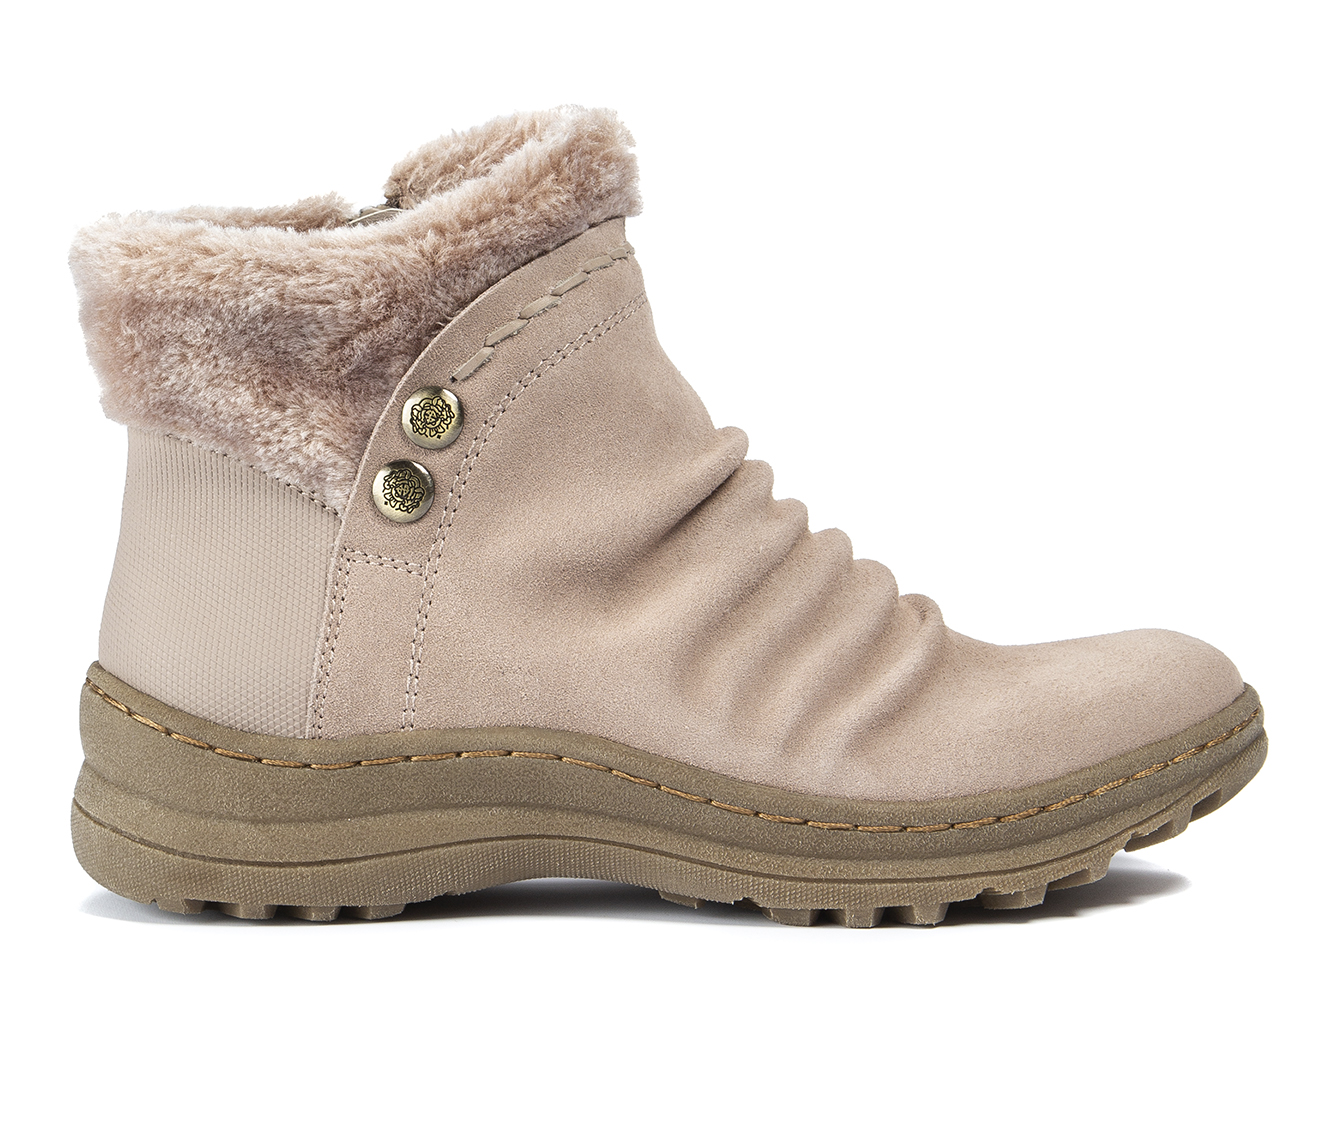 Baretraps Alick Women's Boot (Beige Leather)